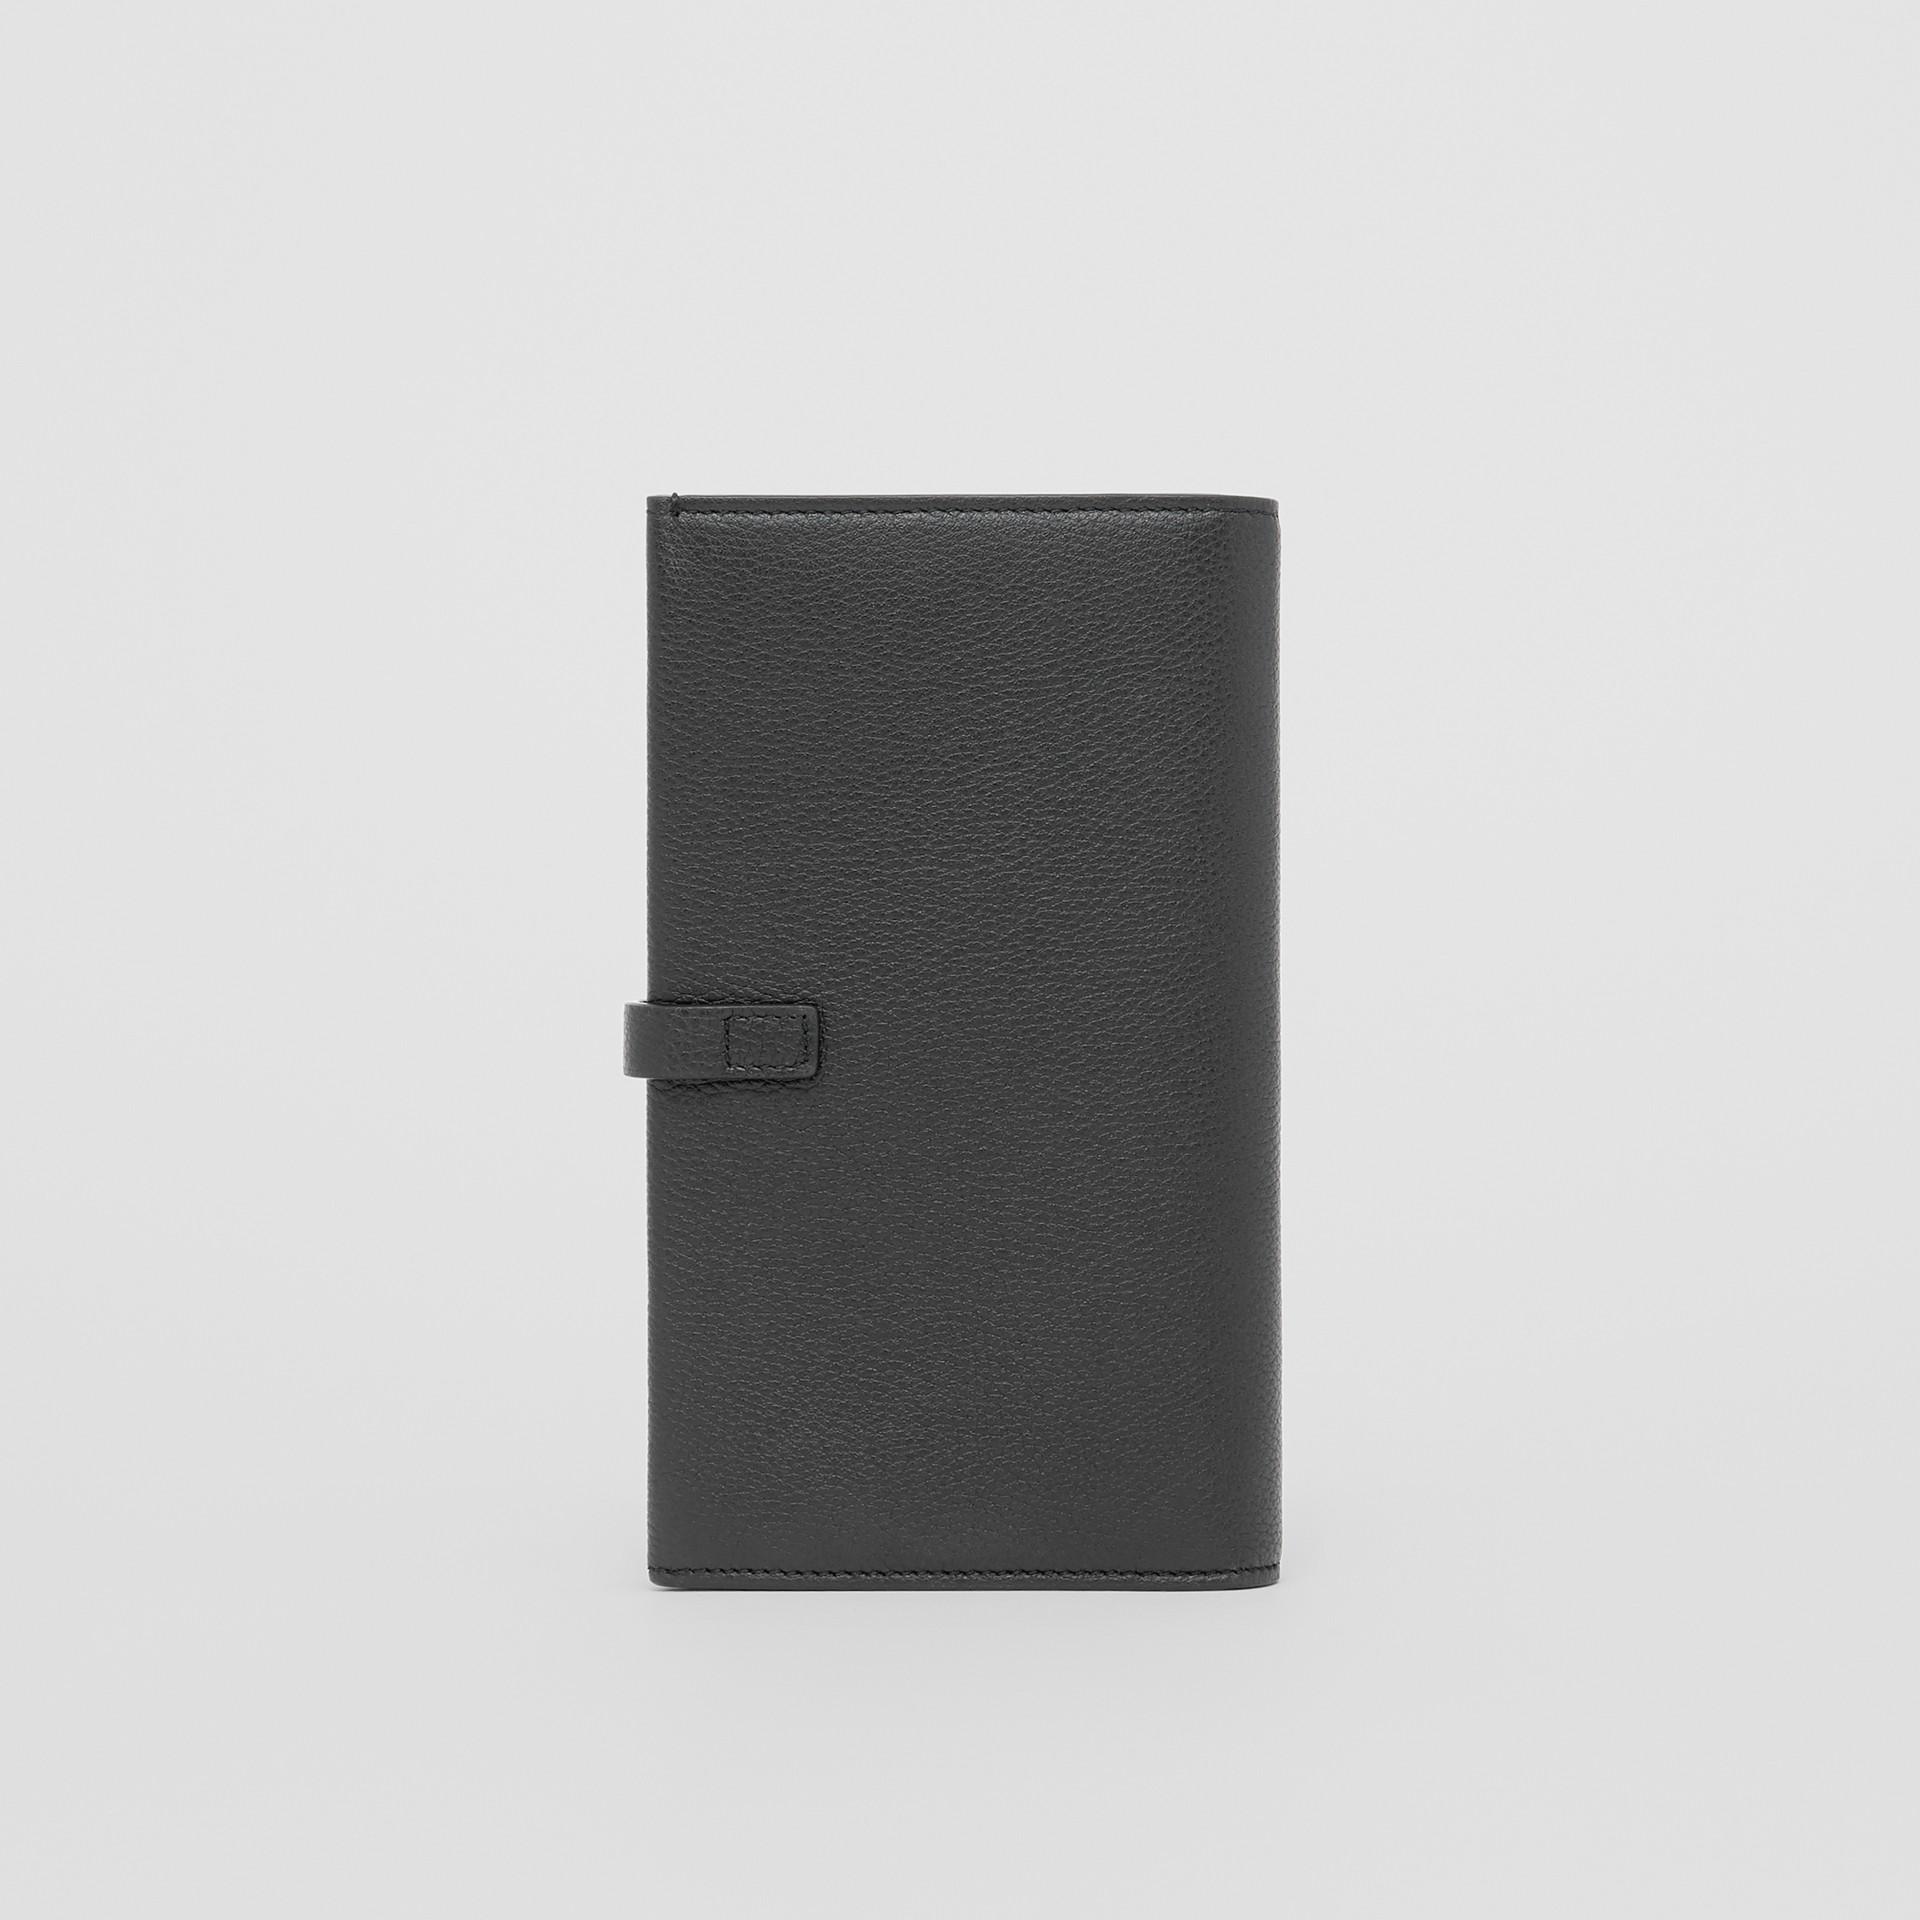 Monogram Motif Grainy Leather Folding Wallet in Black - Women | Burberry - gallery image 4